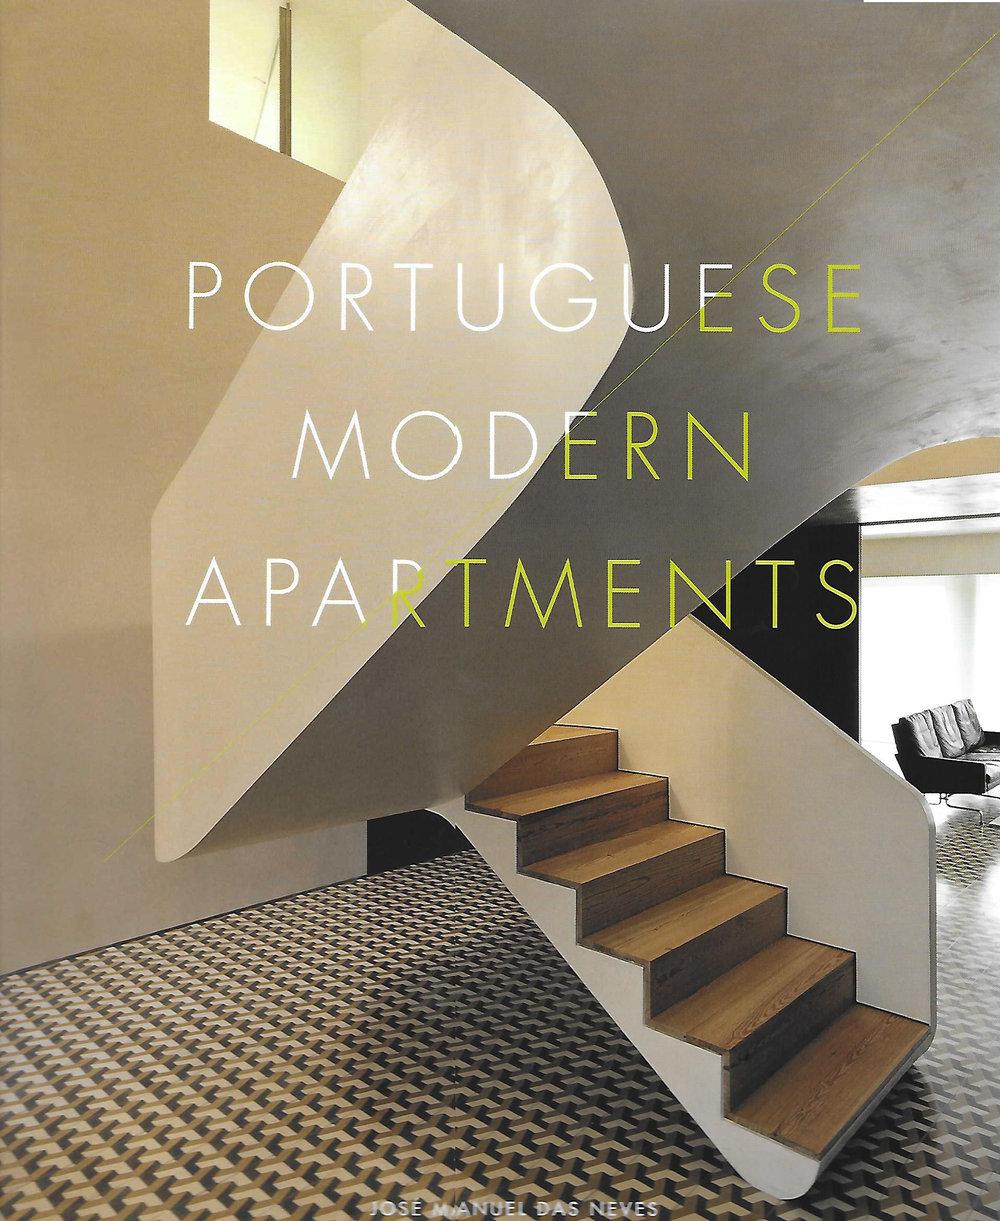 PRINCIPE-PORTUGUESE MODERN APARTMENTS.jpg